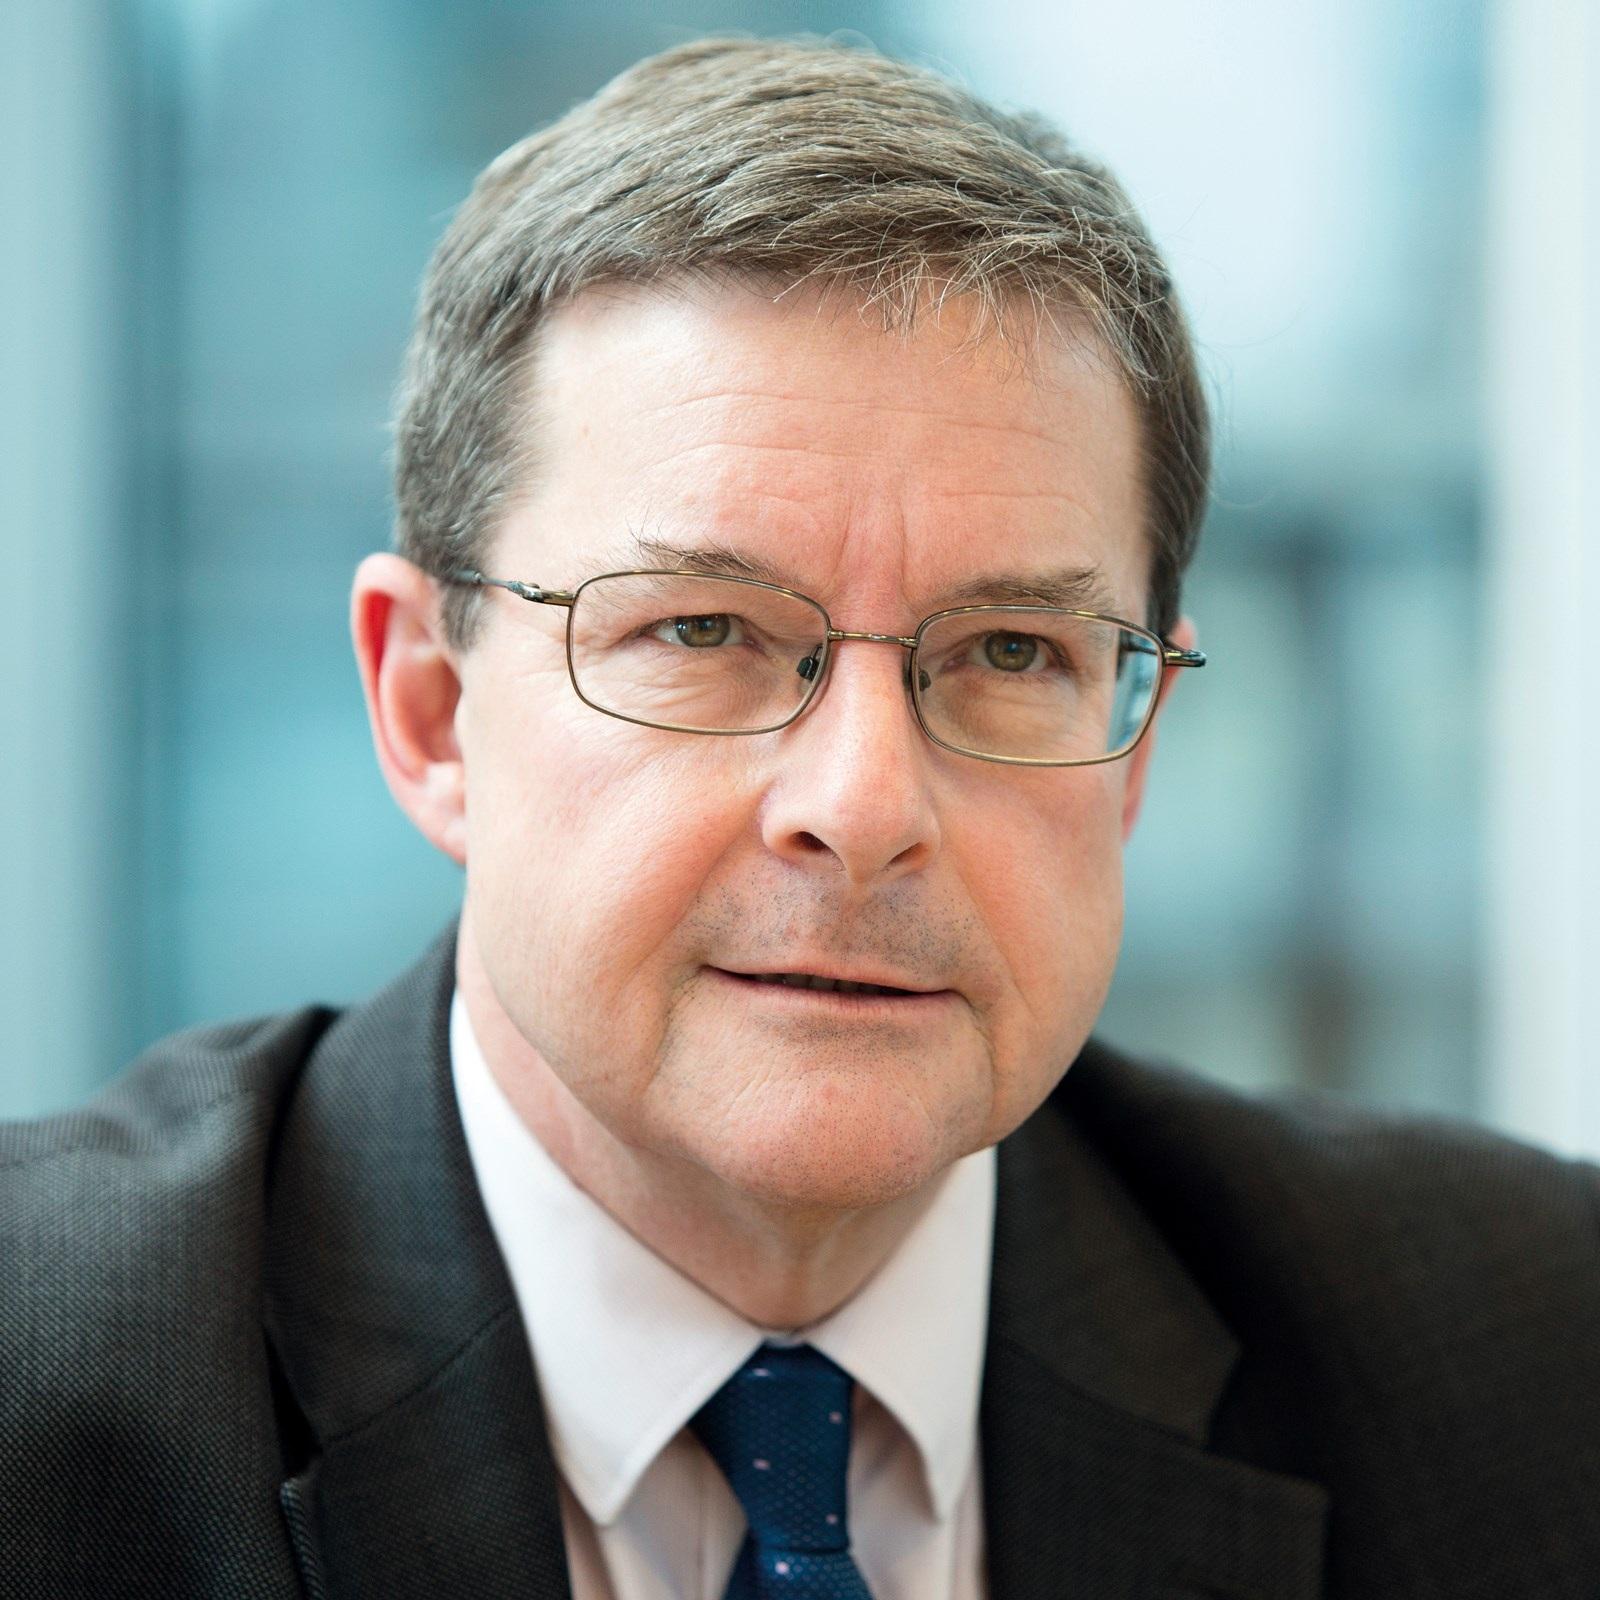 John Godfrey - Corporate Affairs Director, Legal & General